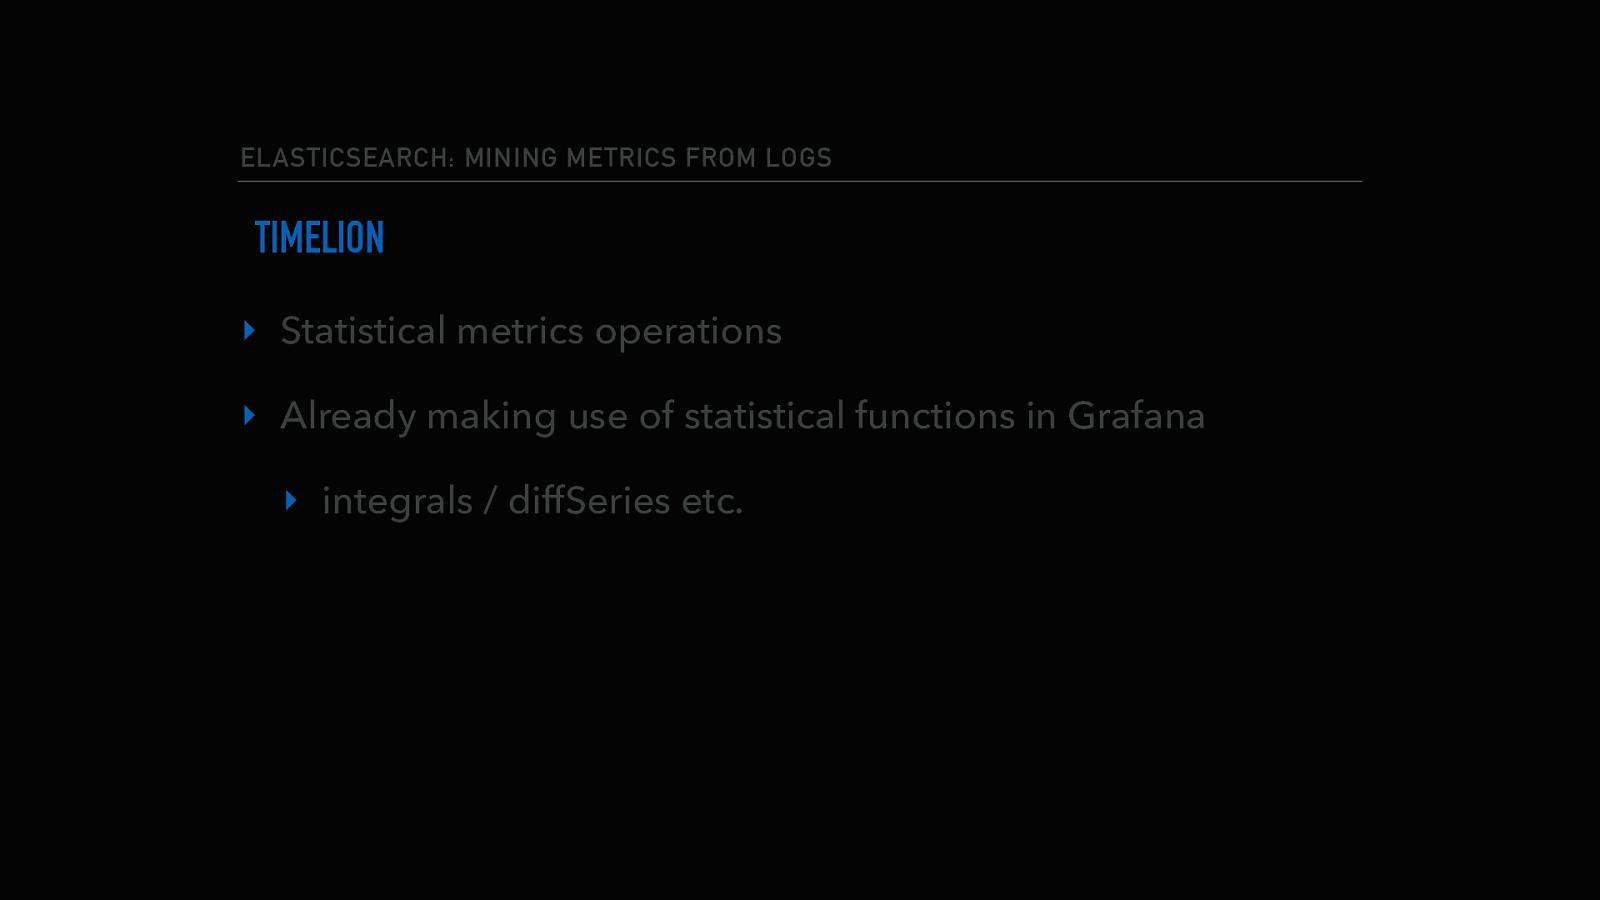 Elasticsearch: Mining Metrics from Logs